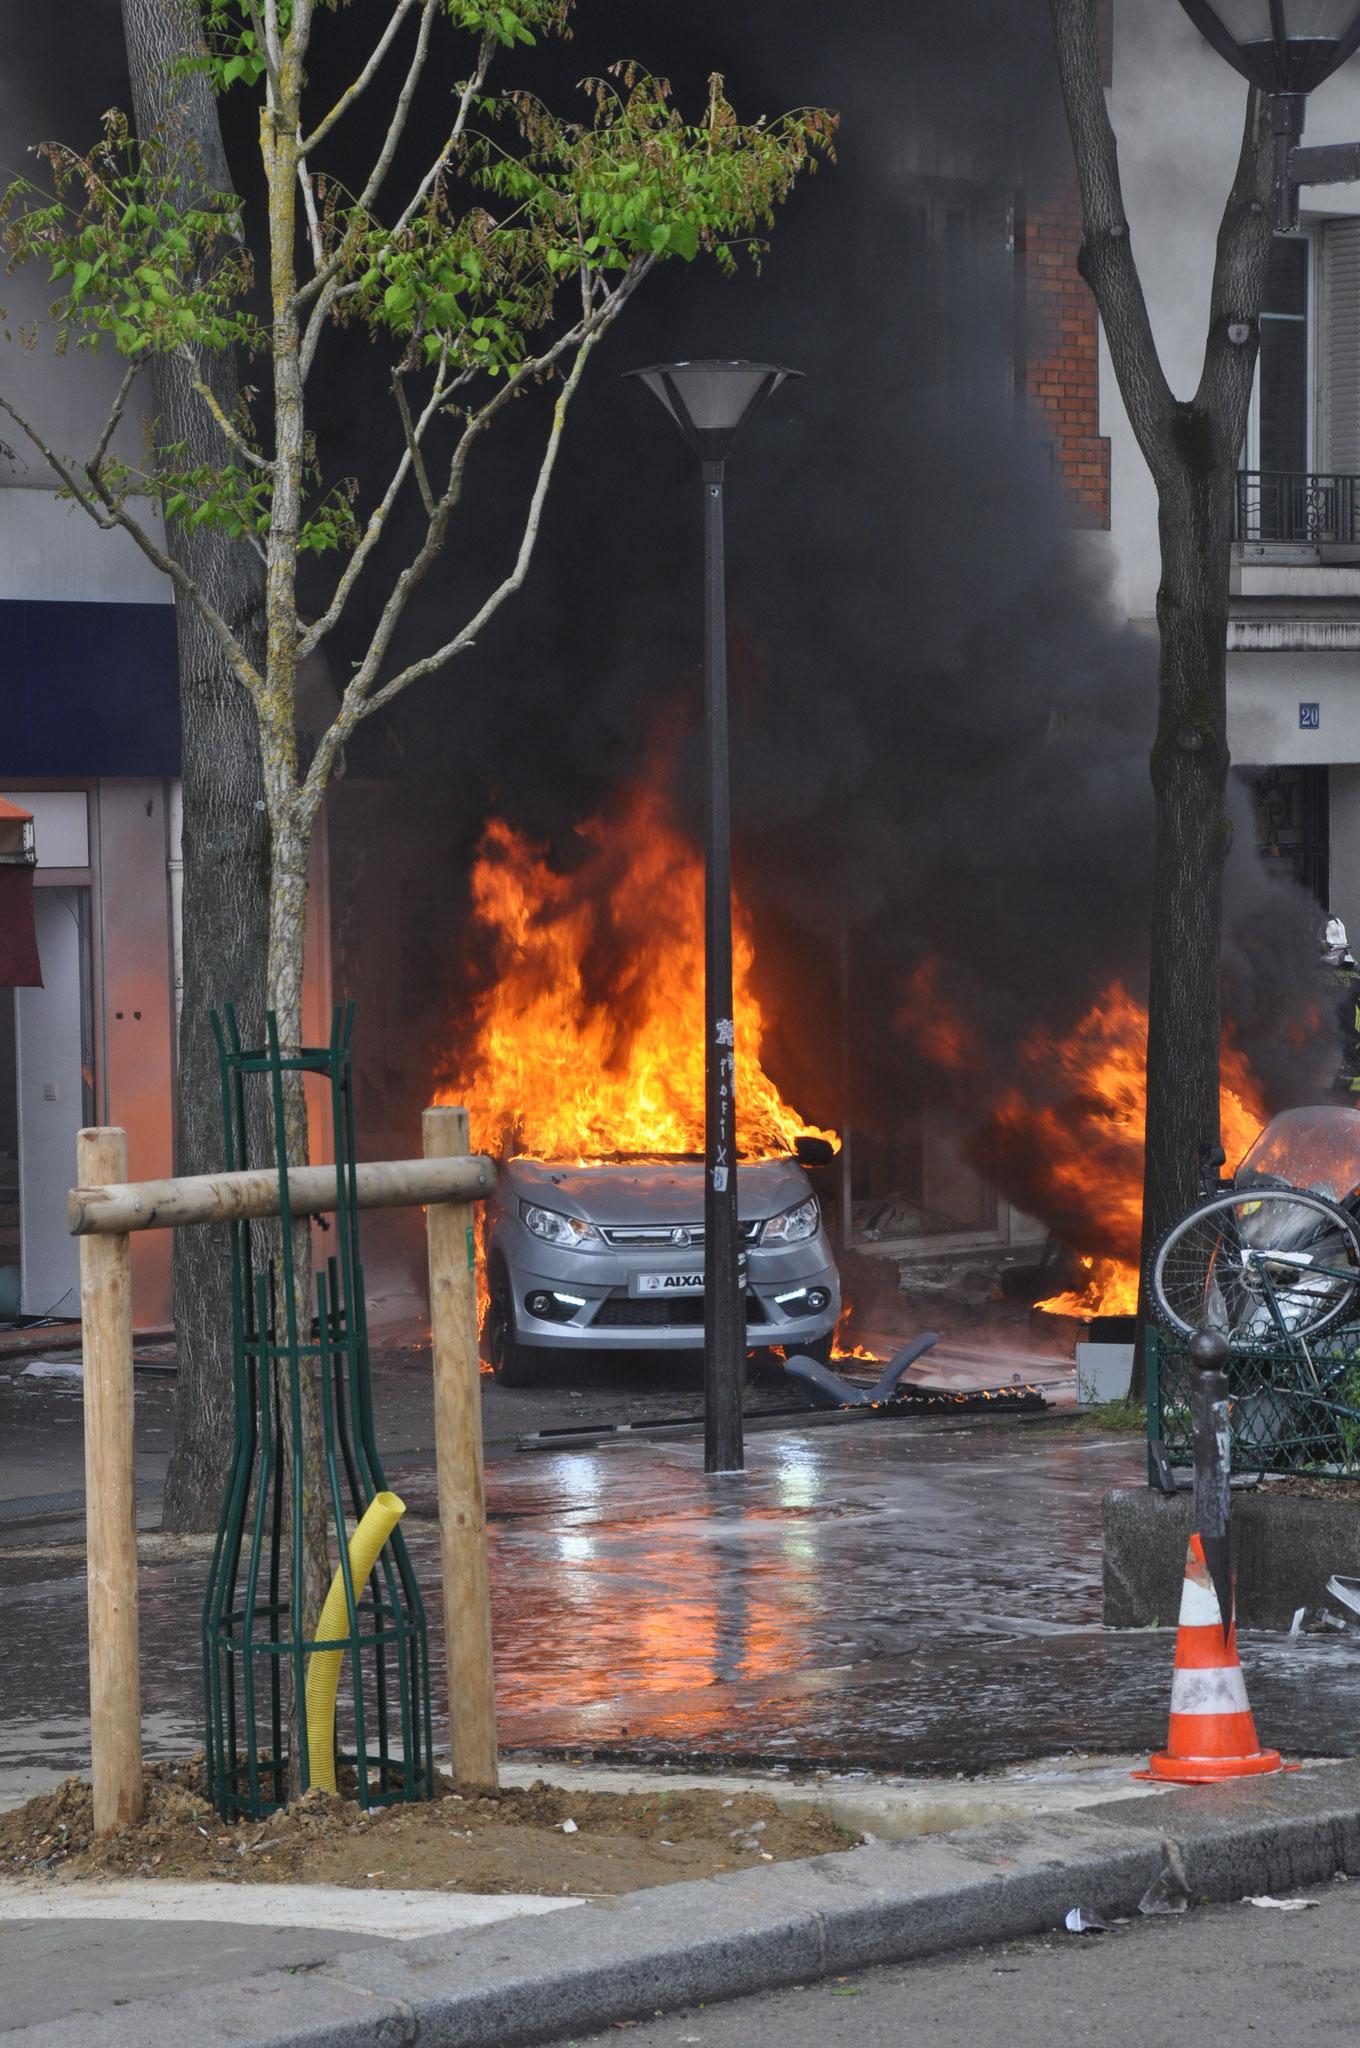 1er mai 2018 - Paris. Crédit : Jean-Luc Beaud